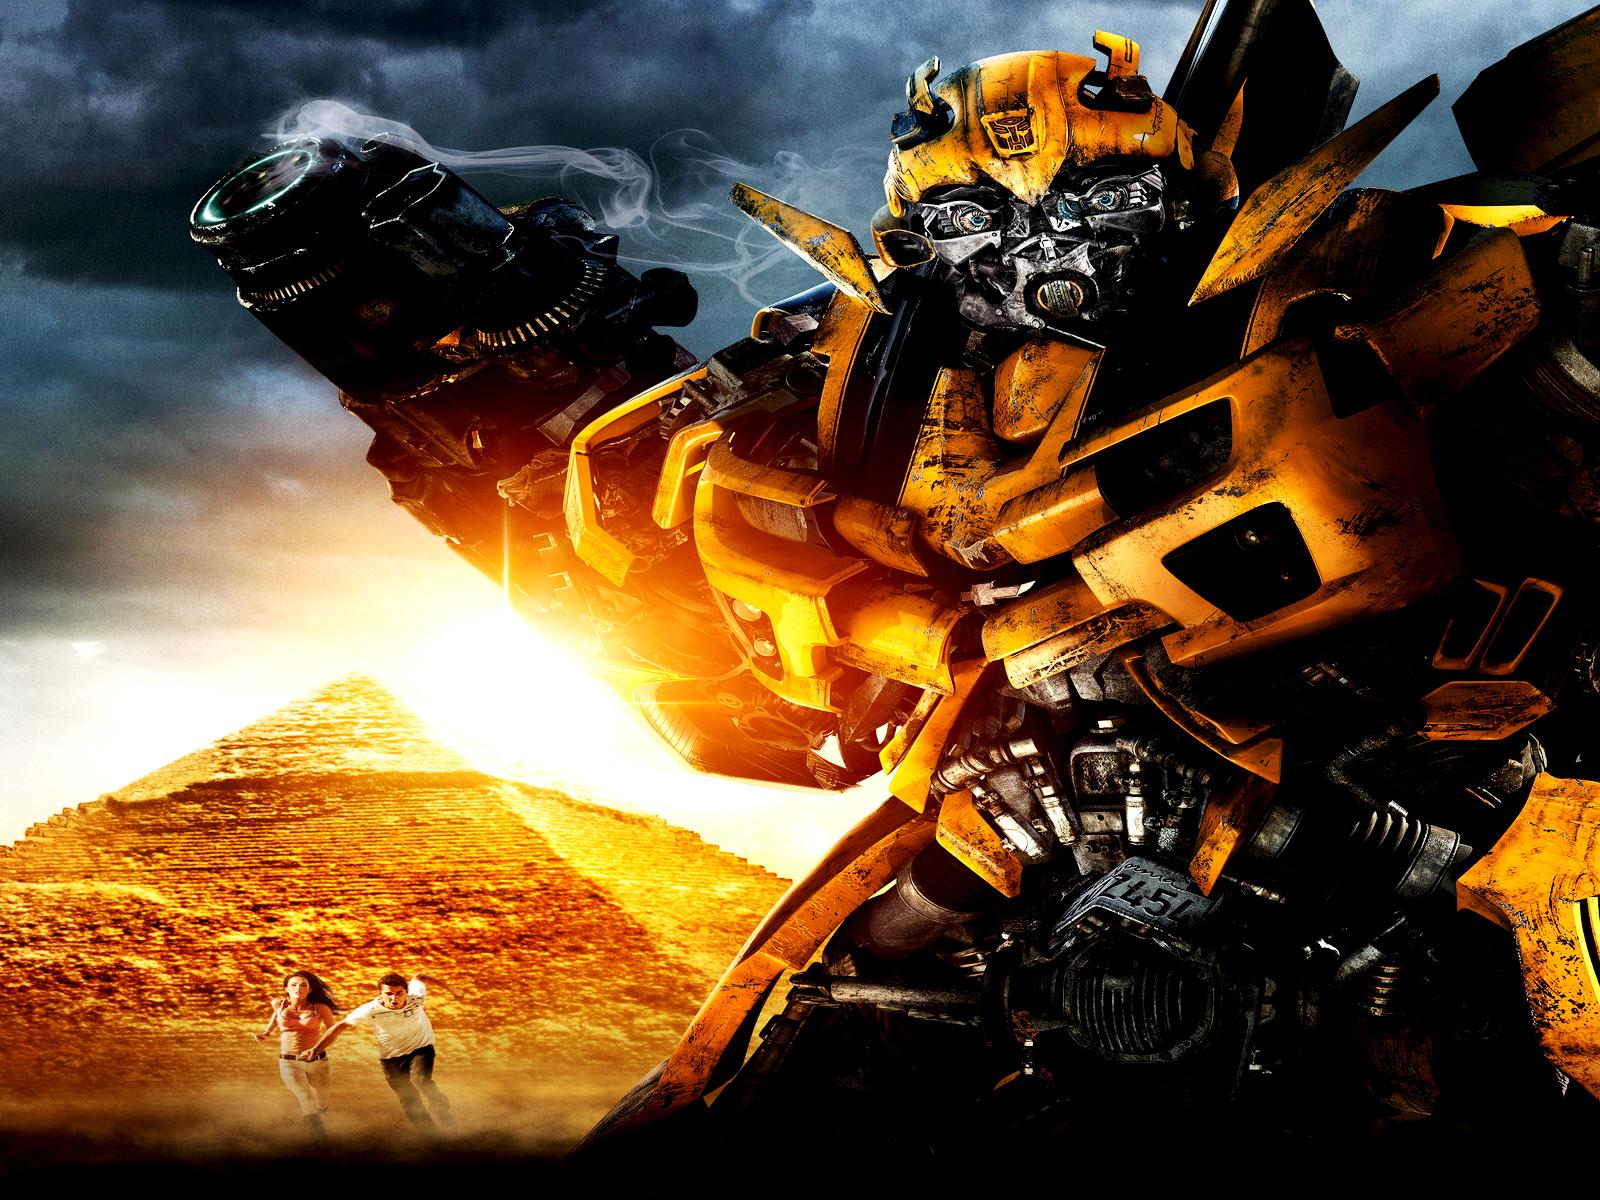 Bumblebee Transformers HD Wallpapers HD Wallpapers 1600x1200